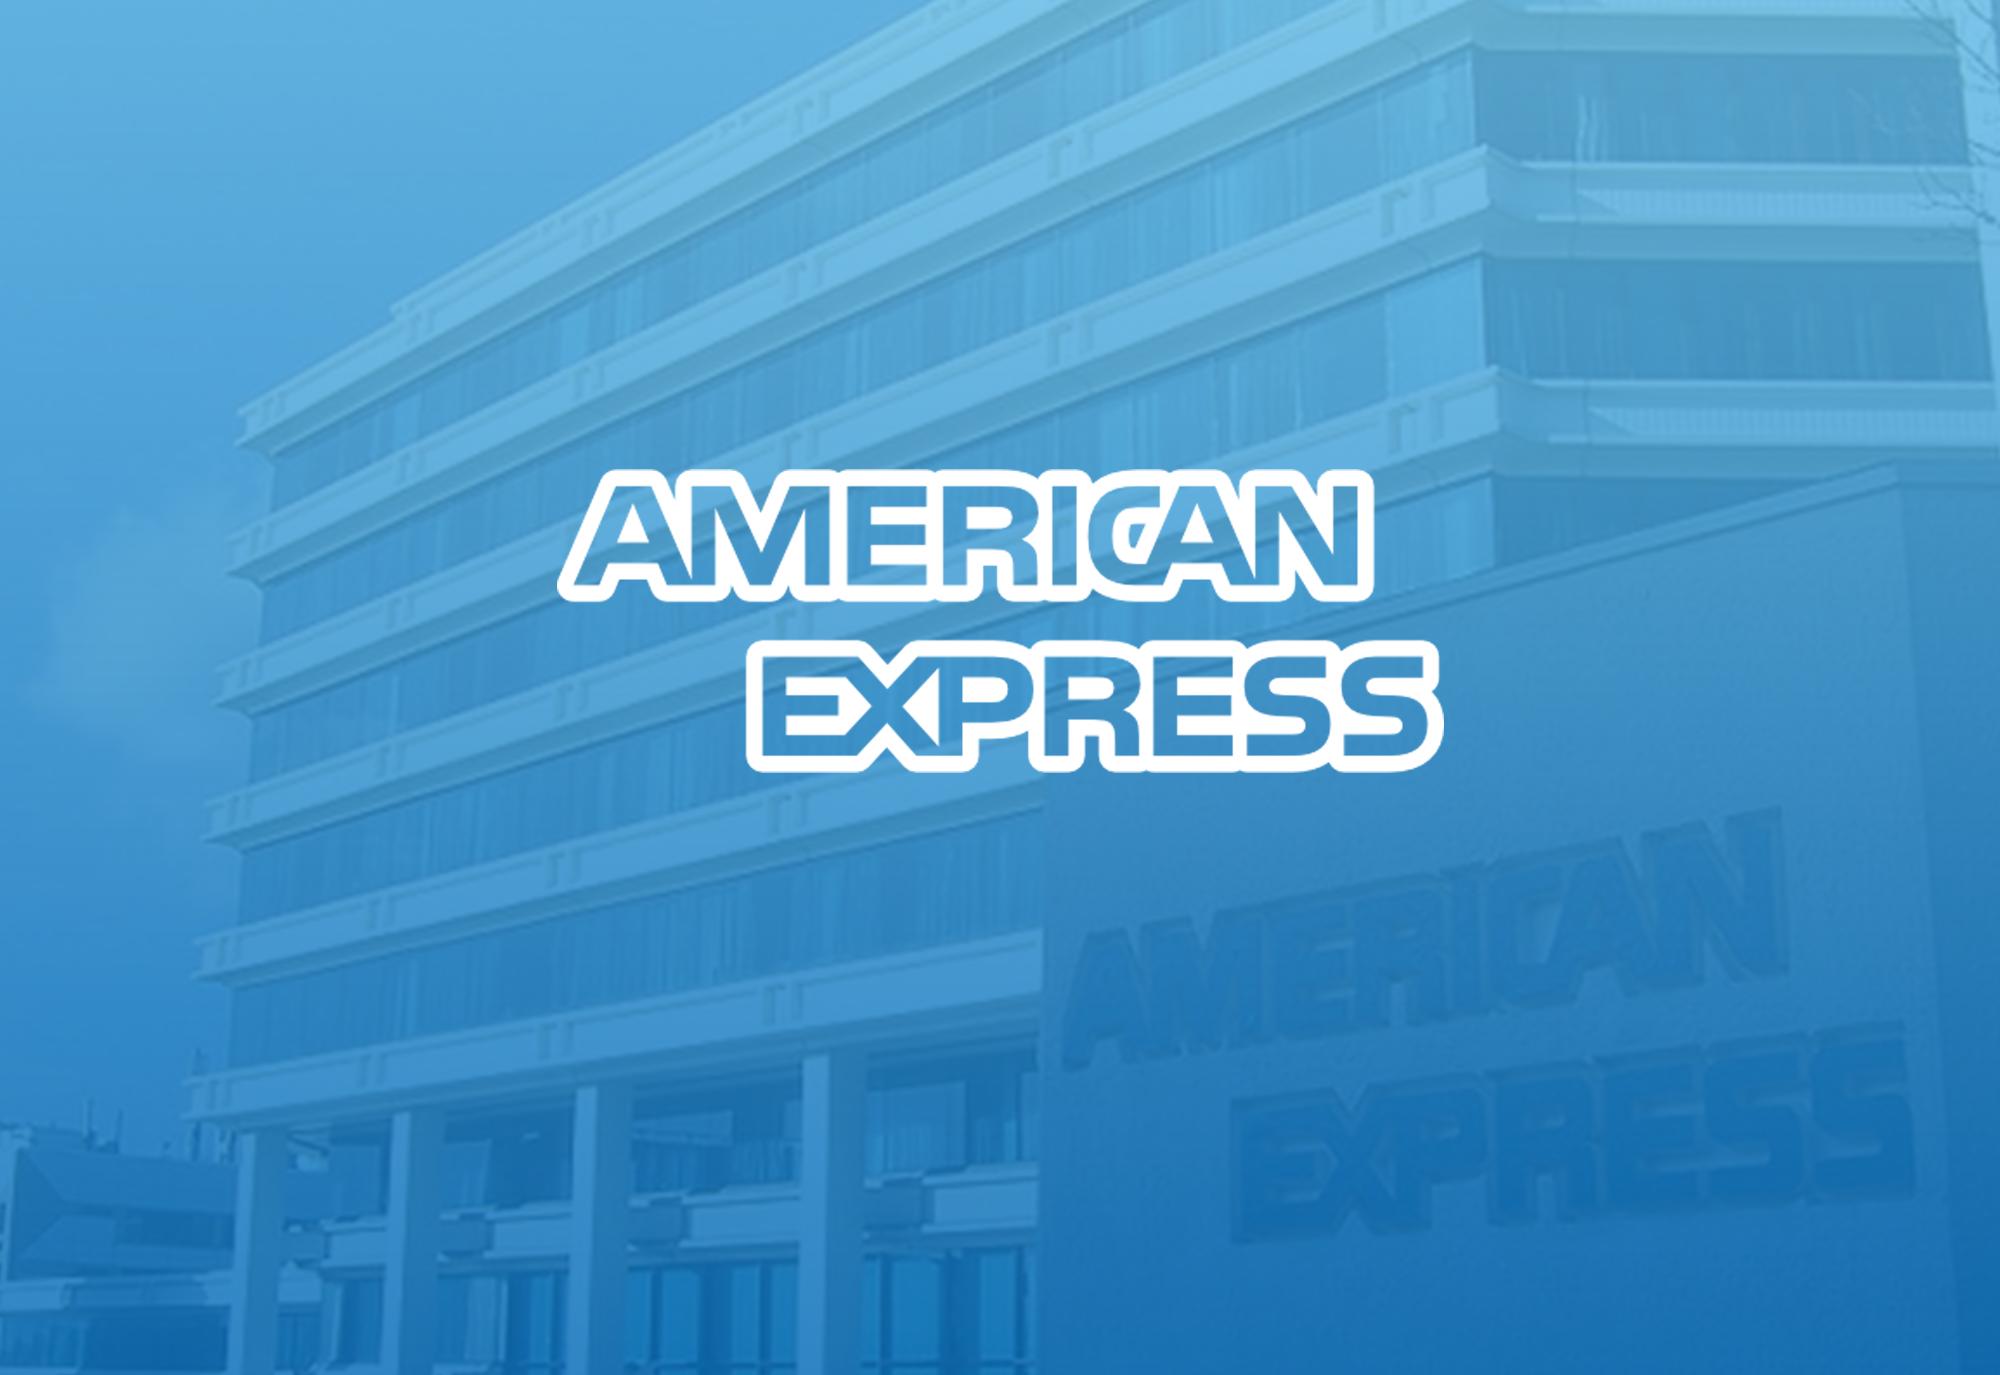 American Express Membership Rewards Program Overview